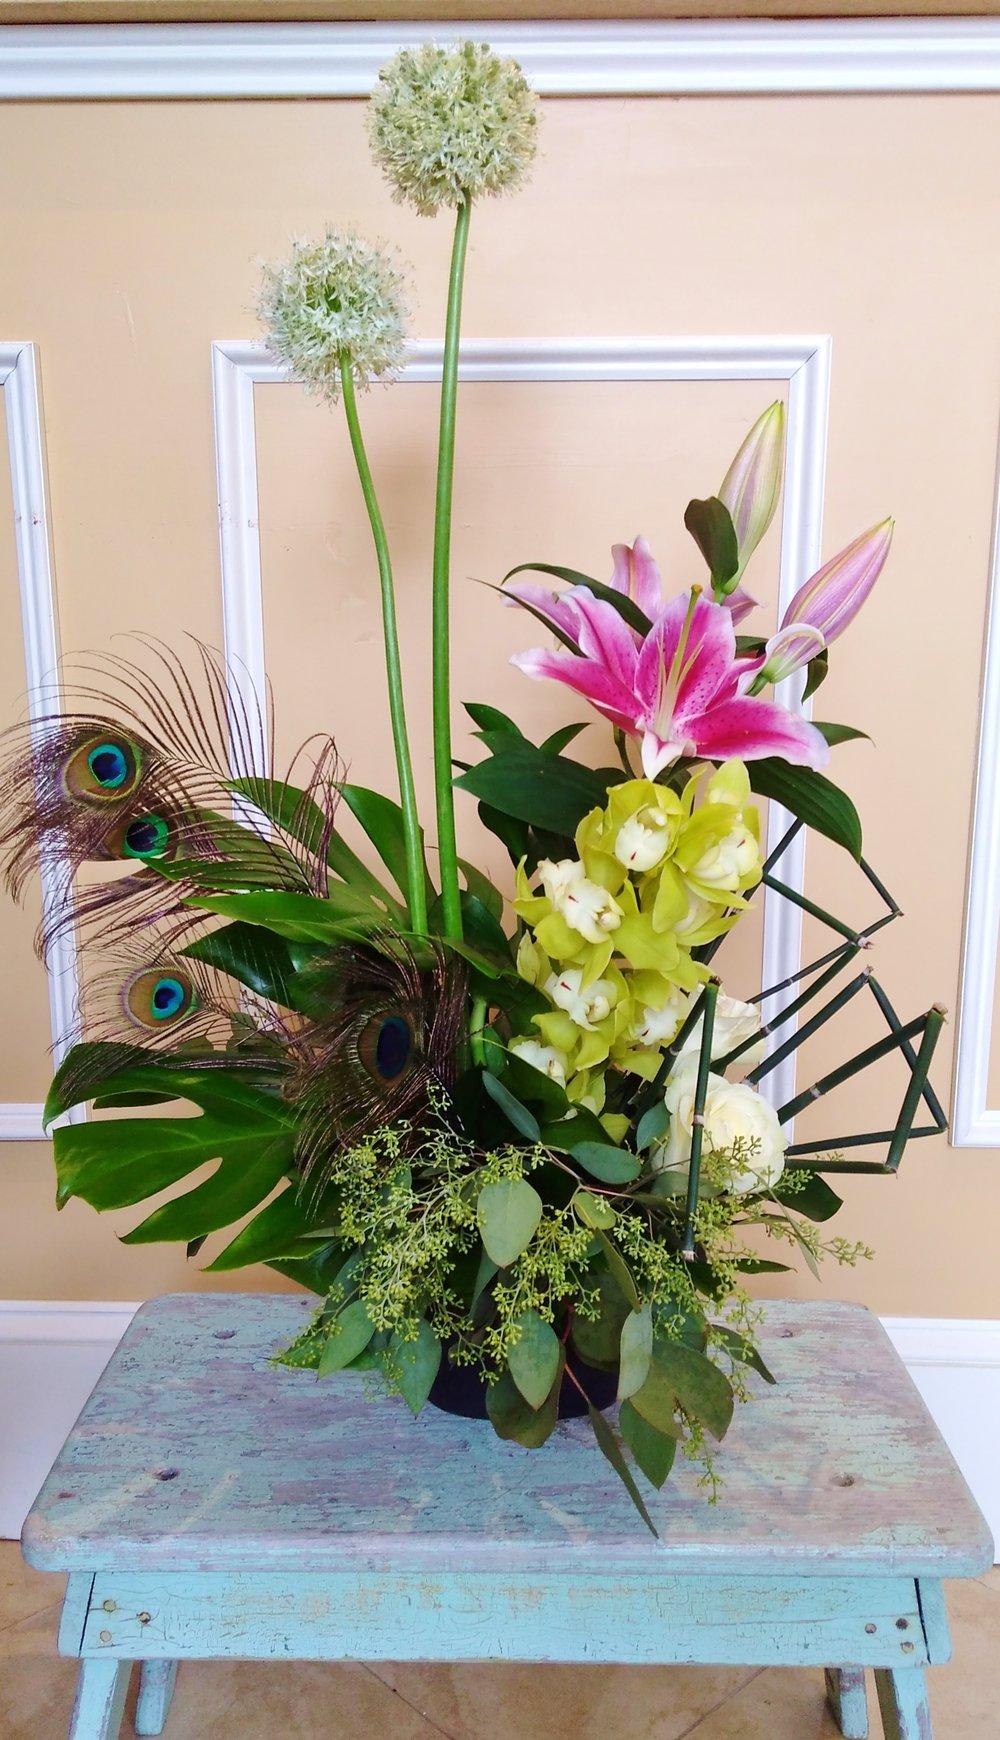 B2 $100-$200 Contemporary arrangement. $100 as shown.